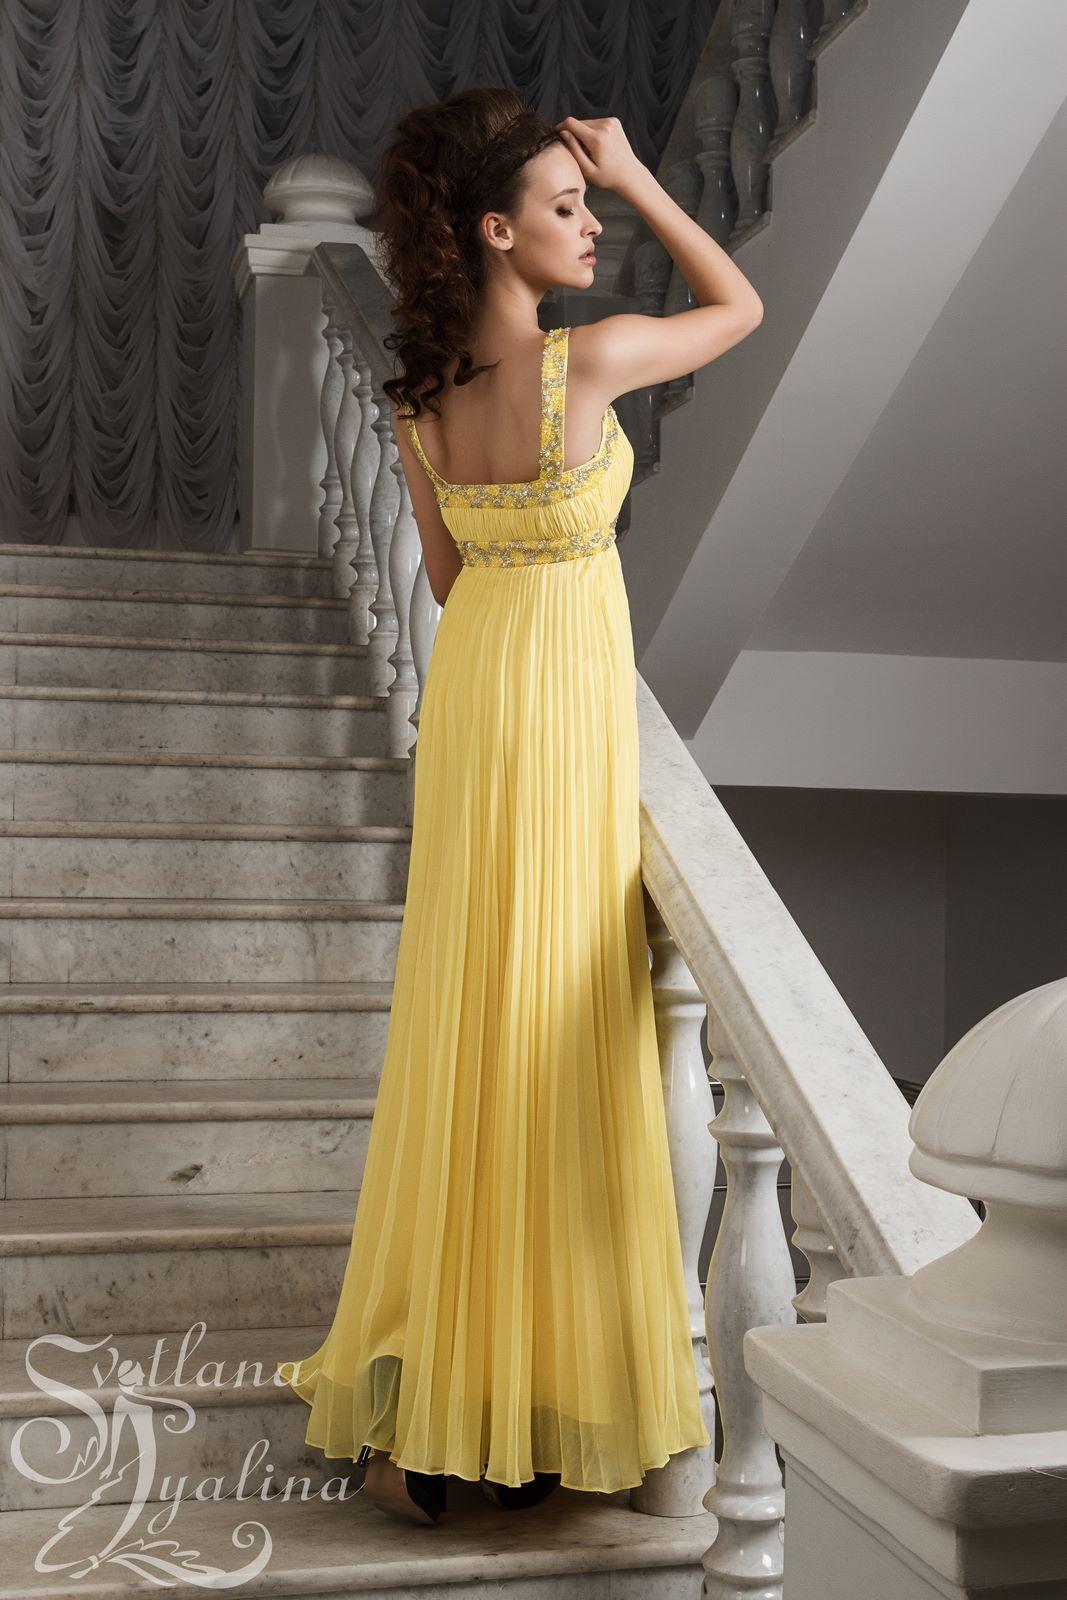 Pin by priya avi sasi on svetlana lyalina evening dresses pinterest